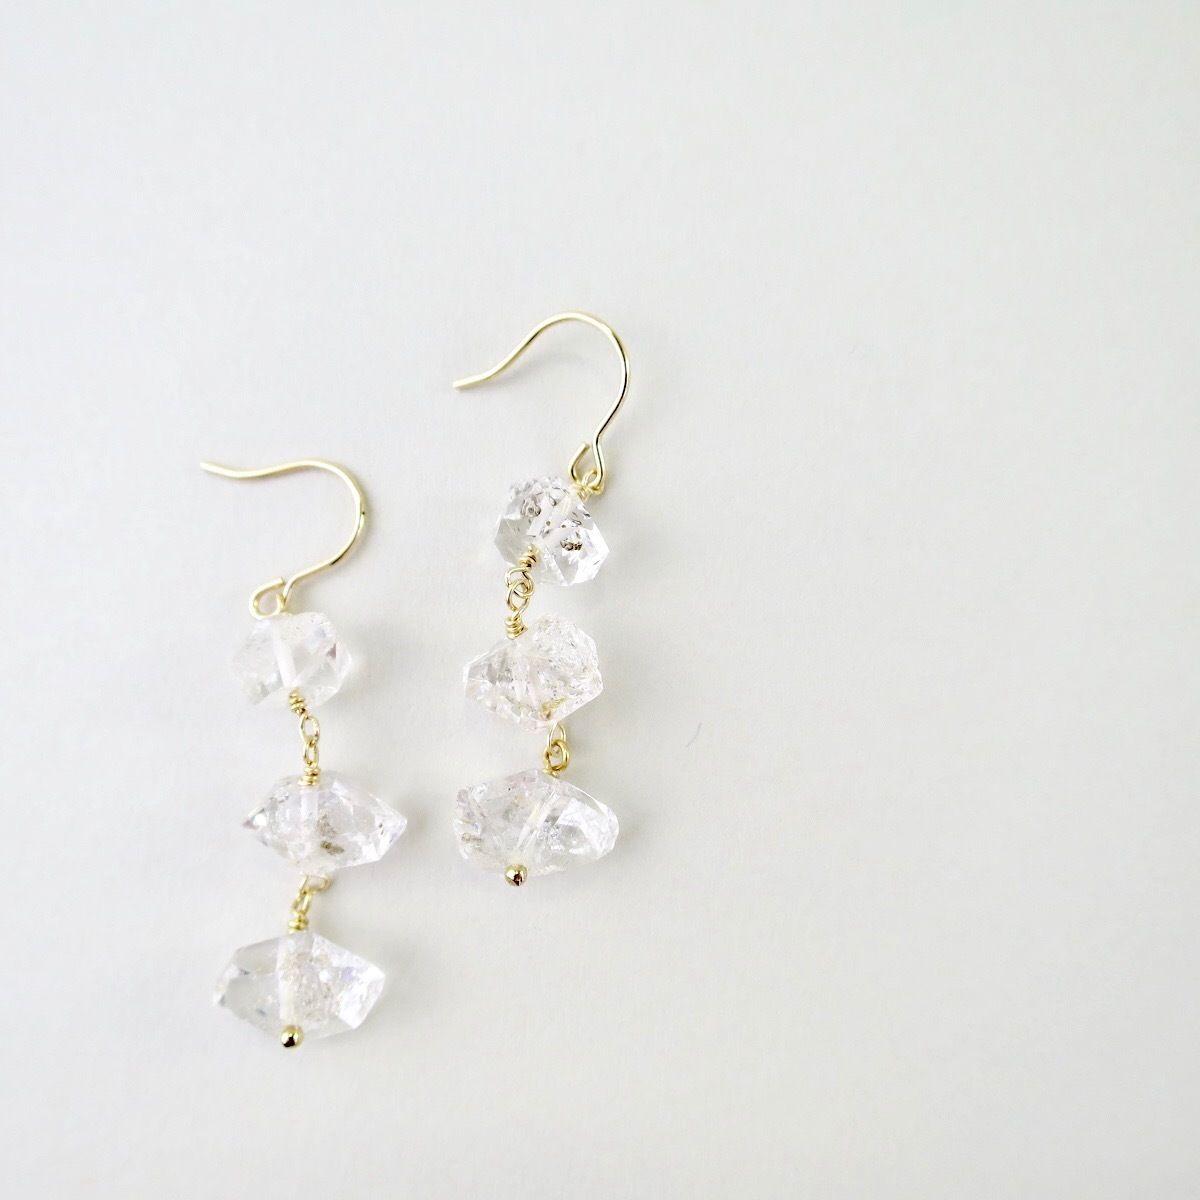 Herkimer diamond  3 Grains Hook Pireced earrings【14kgf】